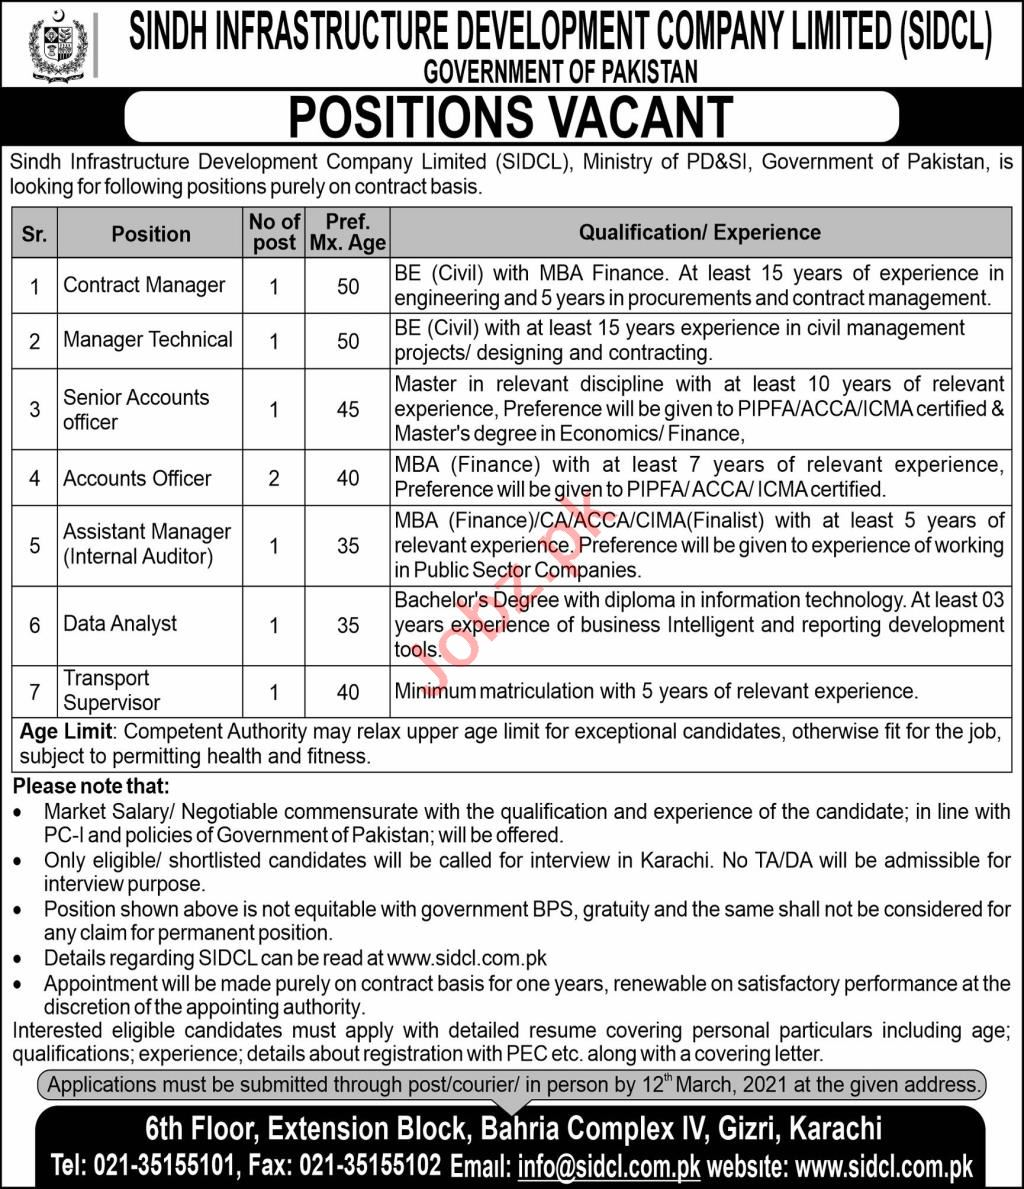 SIDCL Sindh Infrastructure Development Co Karachi Jobs 2021